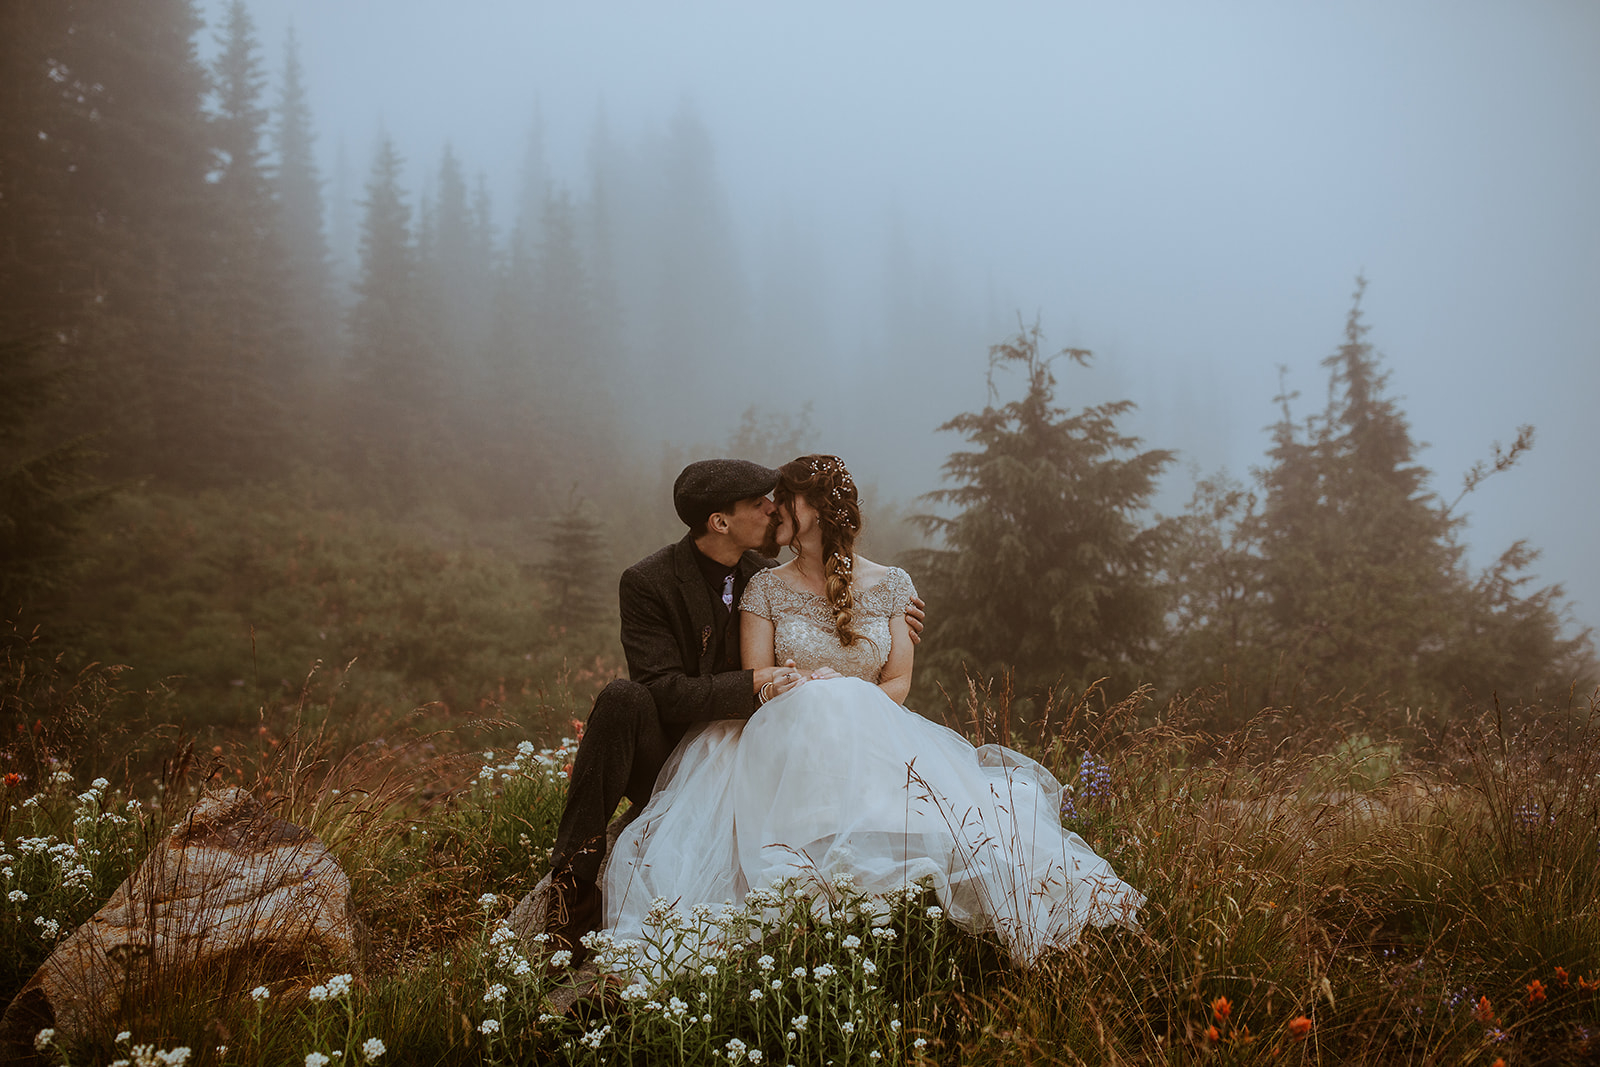 mount-rainier-cabin-elopement-megan-gallagher-photography_(390_of_568).jpg